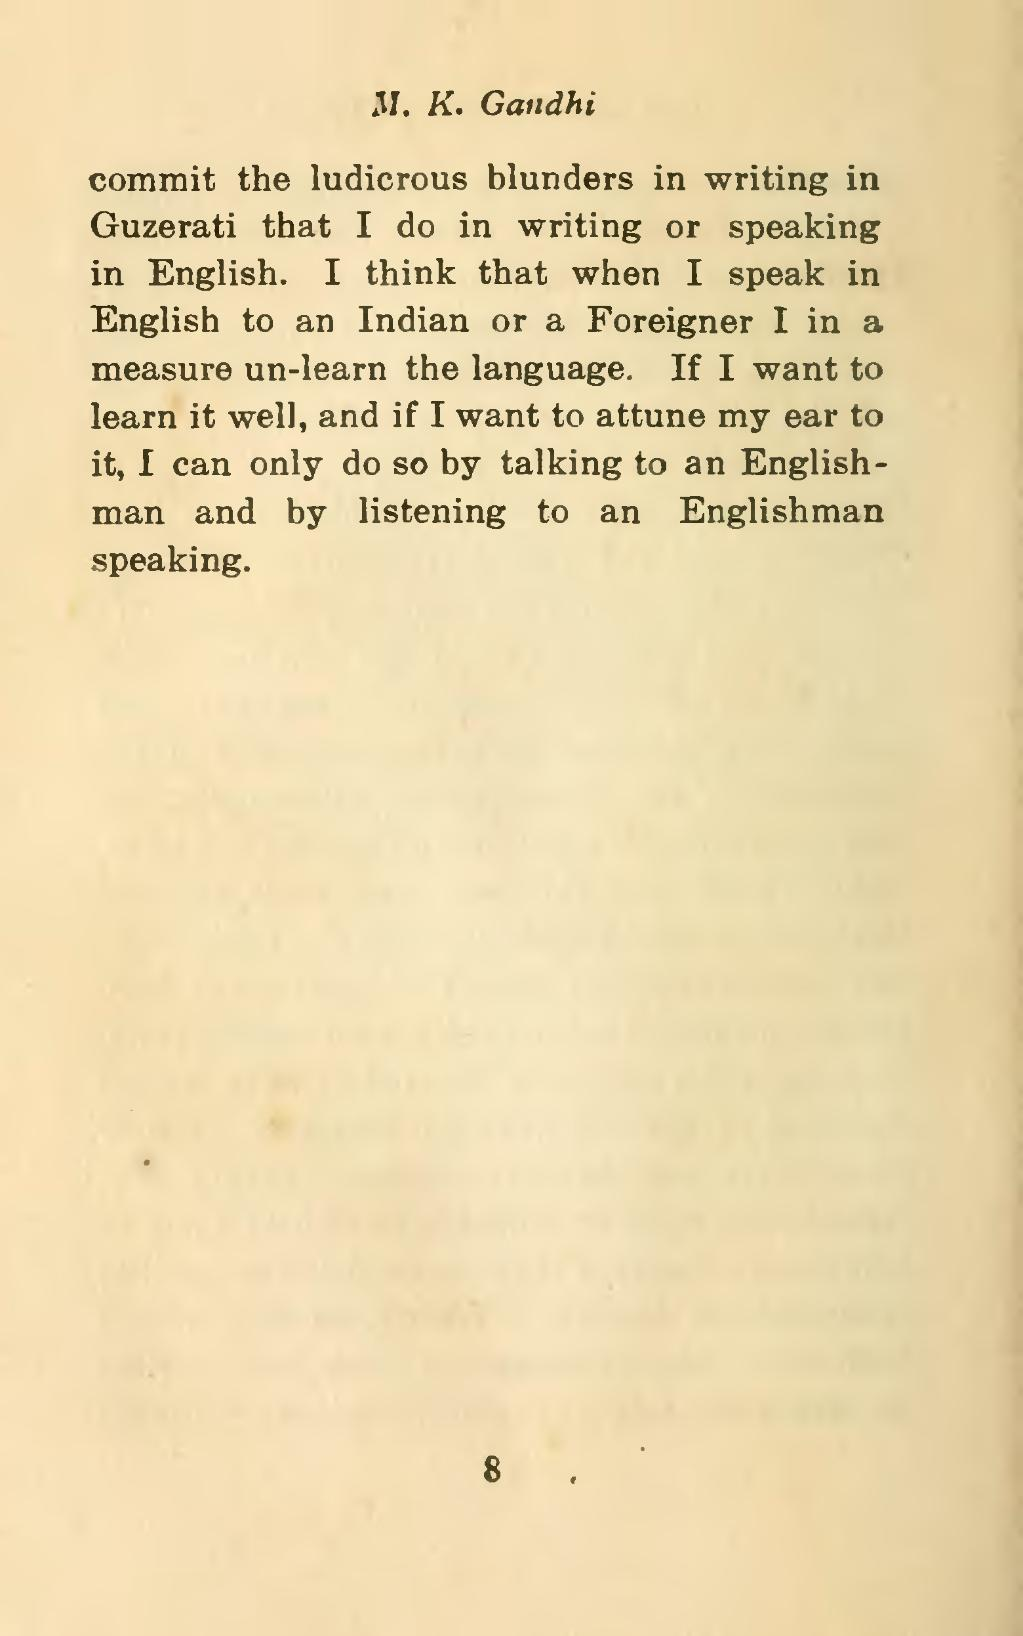 mahatma gandhi information in english speech